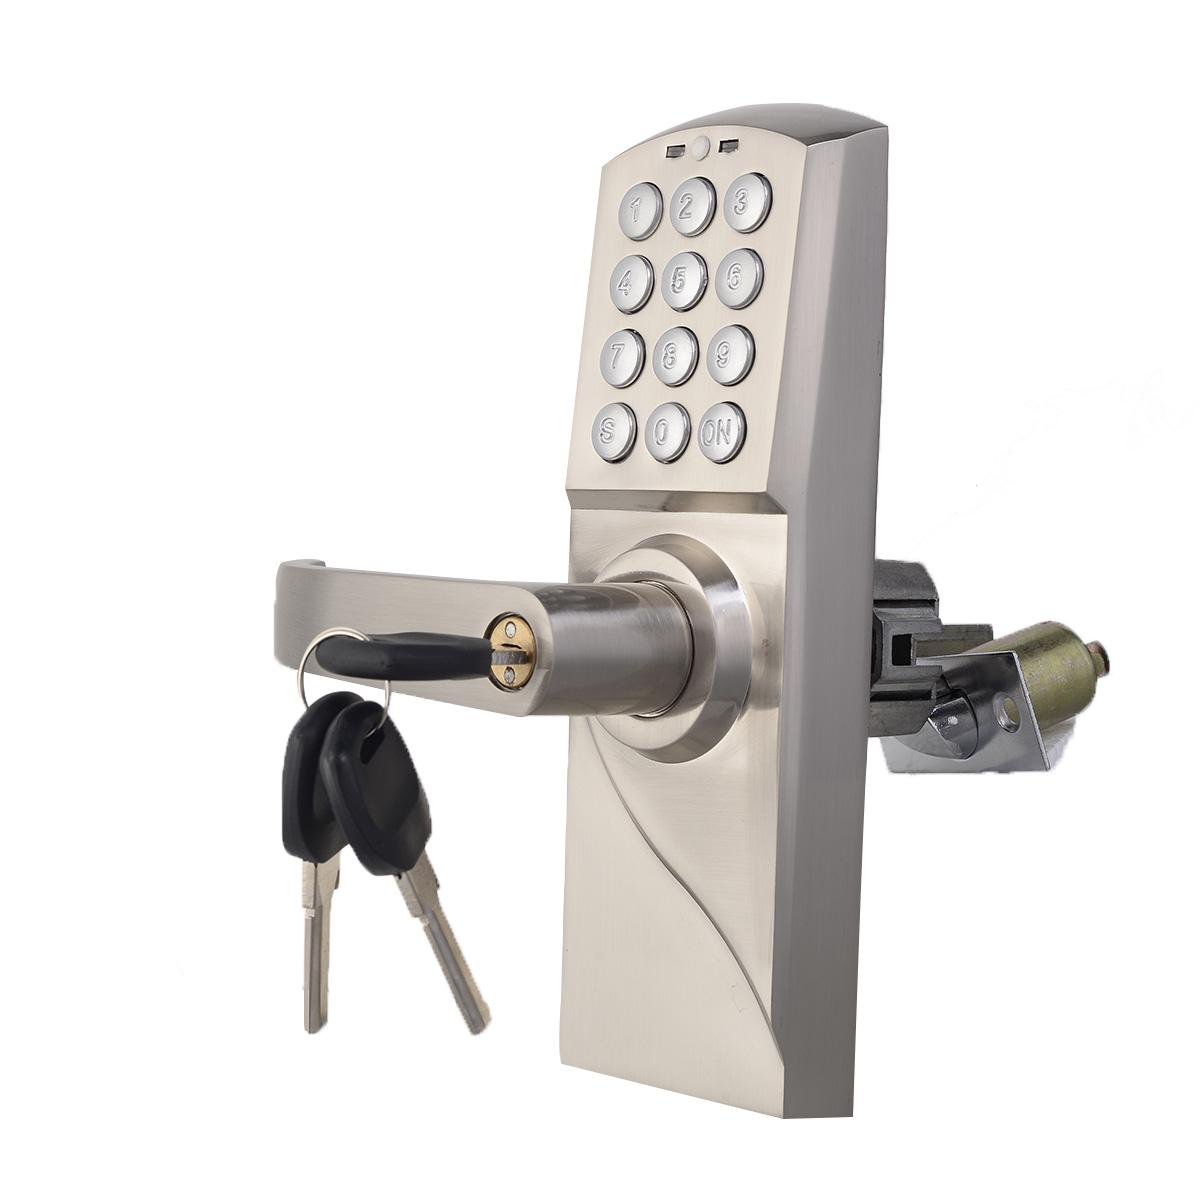 keyless door knob photo - 6